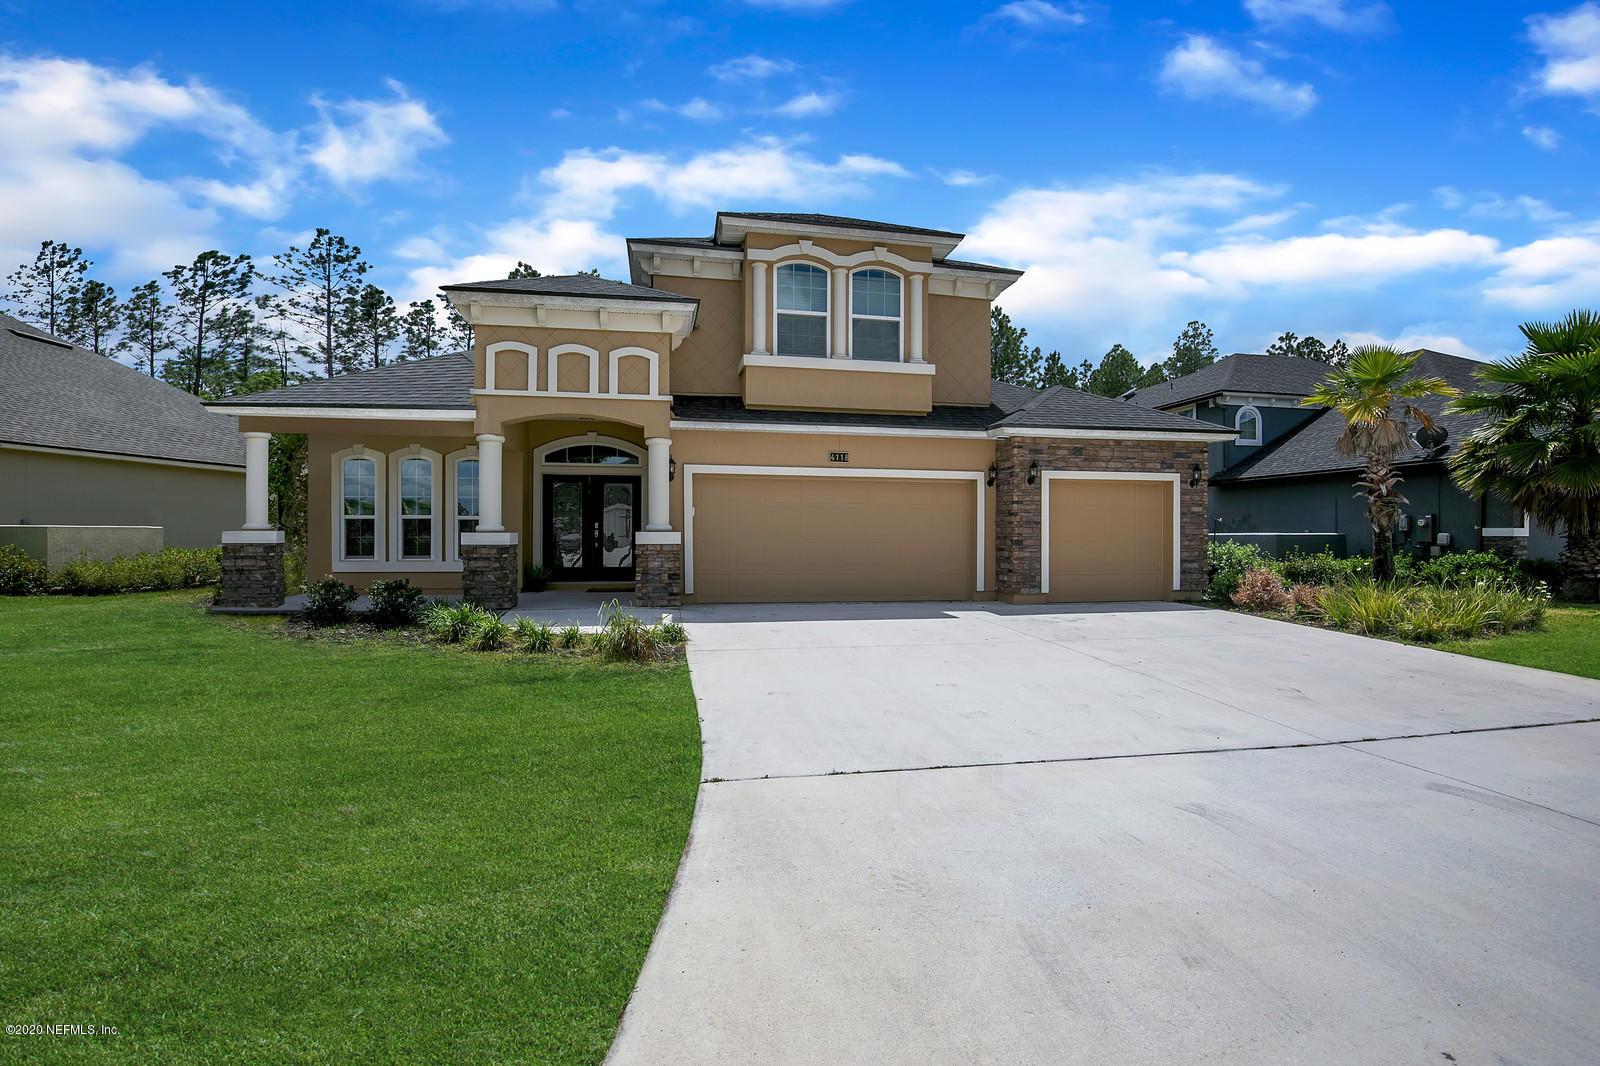 4118 CARRIAGE CROSSING, ORANGE PARK, FLORIDA 32065, 5 Bedrooms Bedrooms, ,4 BathroomsBathrooms,Residential,For sale,CARRIAGE CROSSING,1053574